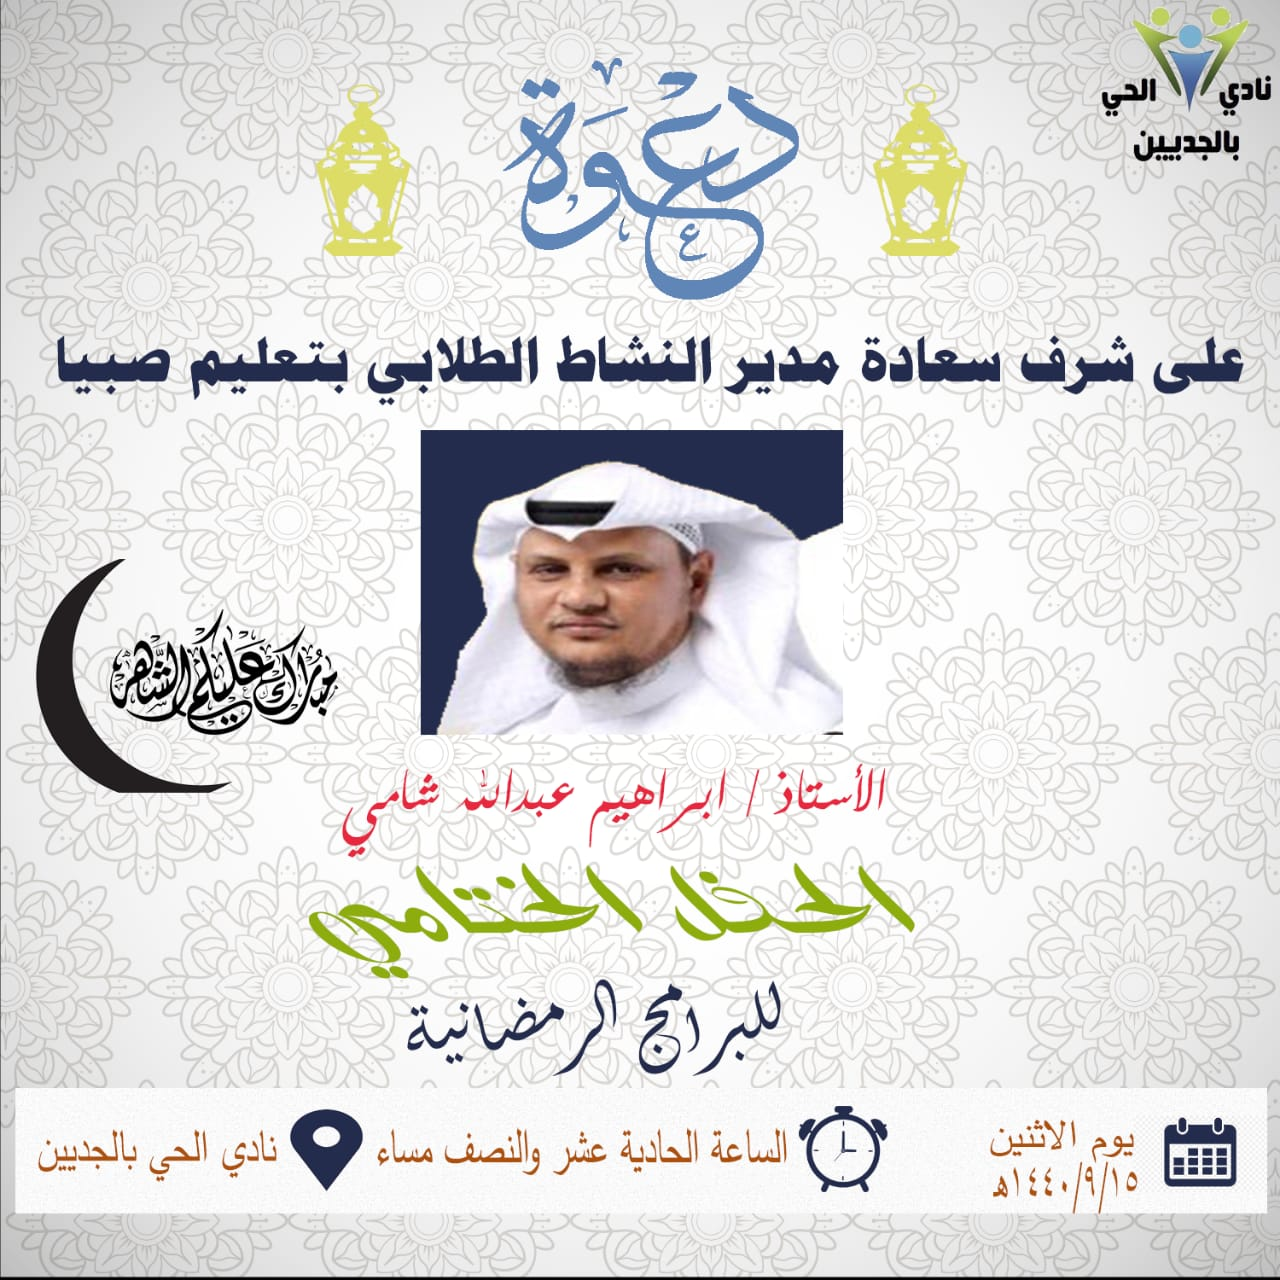 نادي الحي بالجديين يختتم غدا فعاليات برامج رمضان